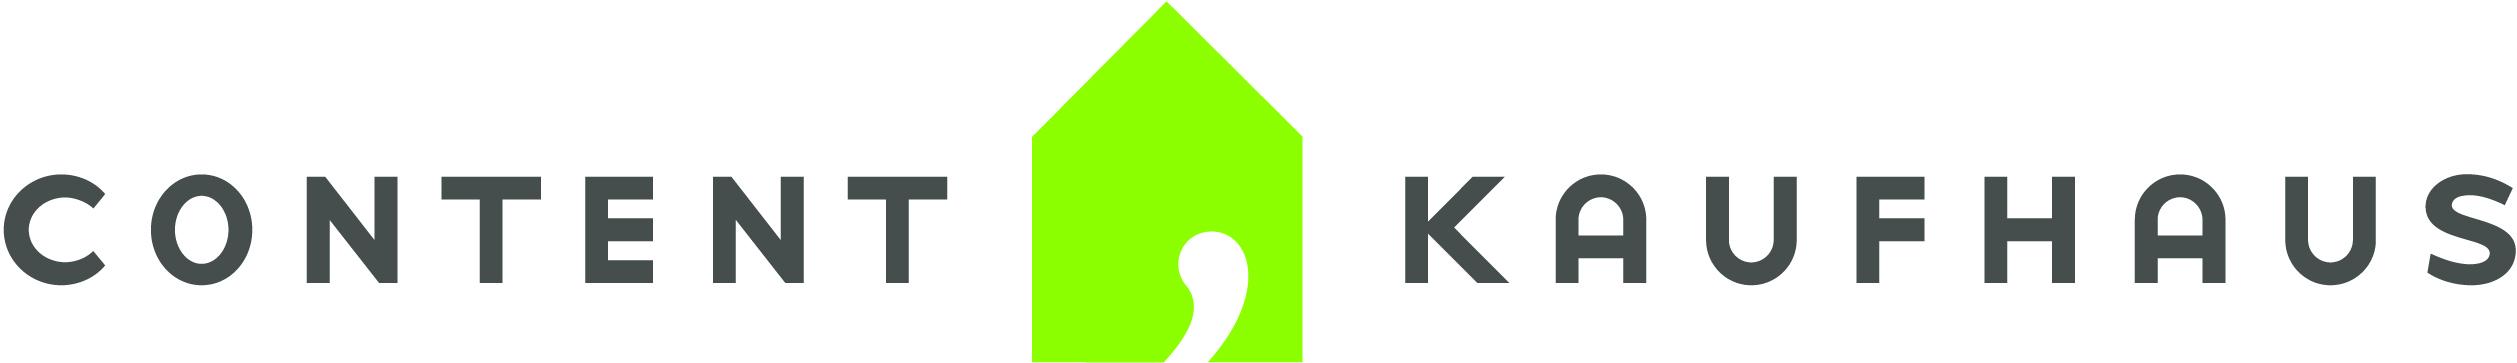 Content Kaufhaus logo